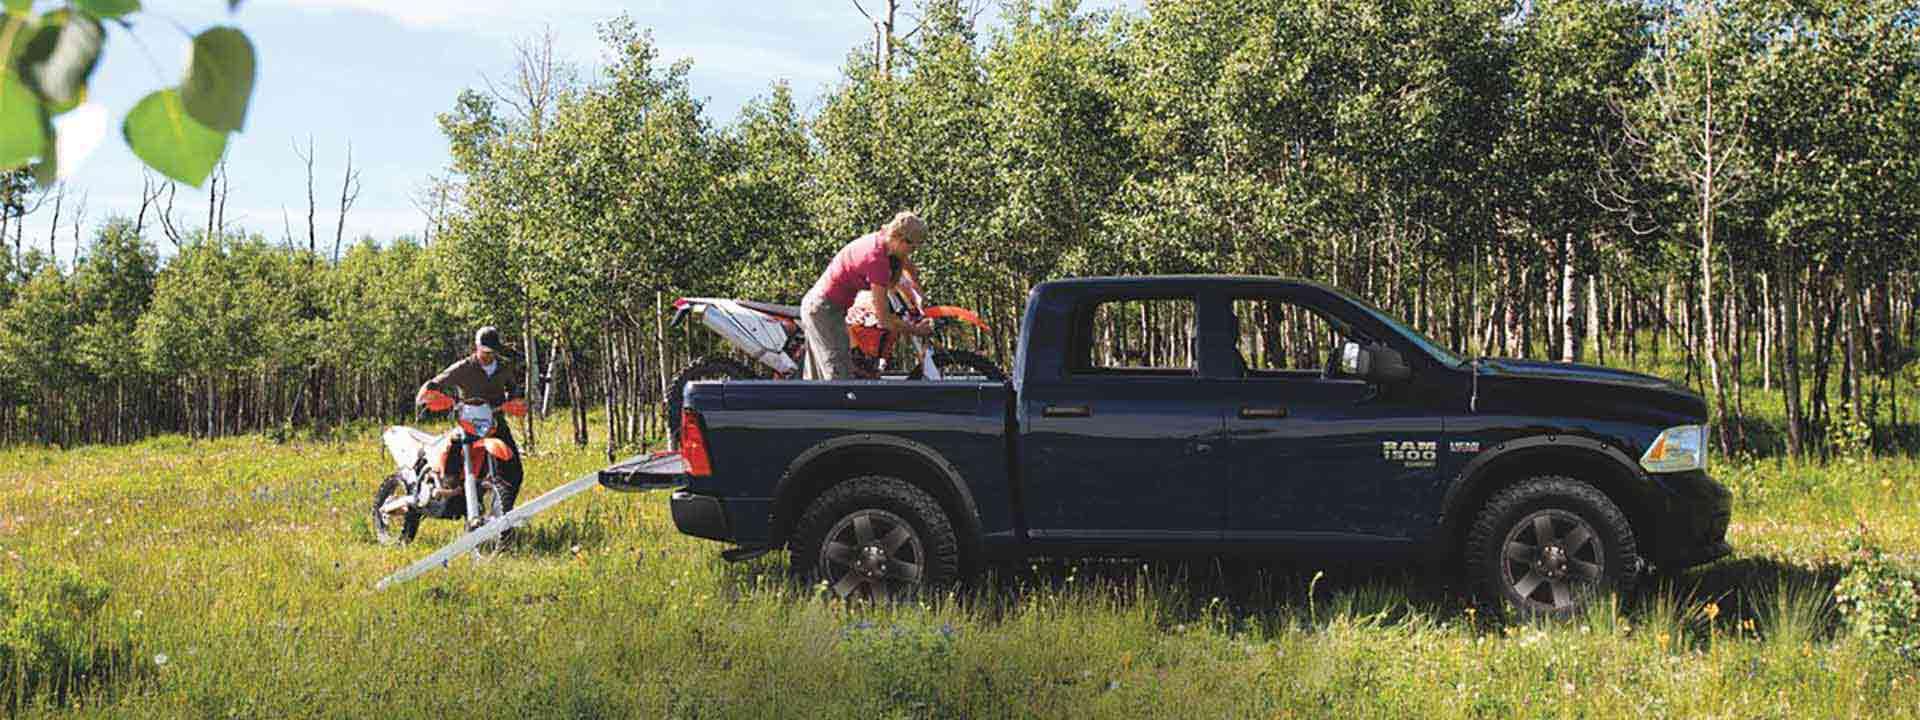 RAM Trucks Australia | Accessories | The Only Authorised Distributor of Ram Trucks in Australia